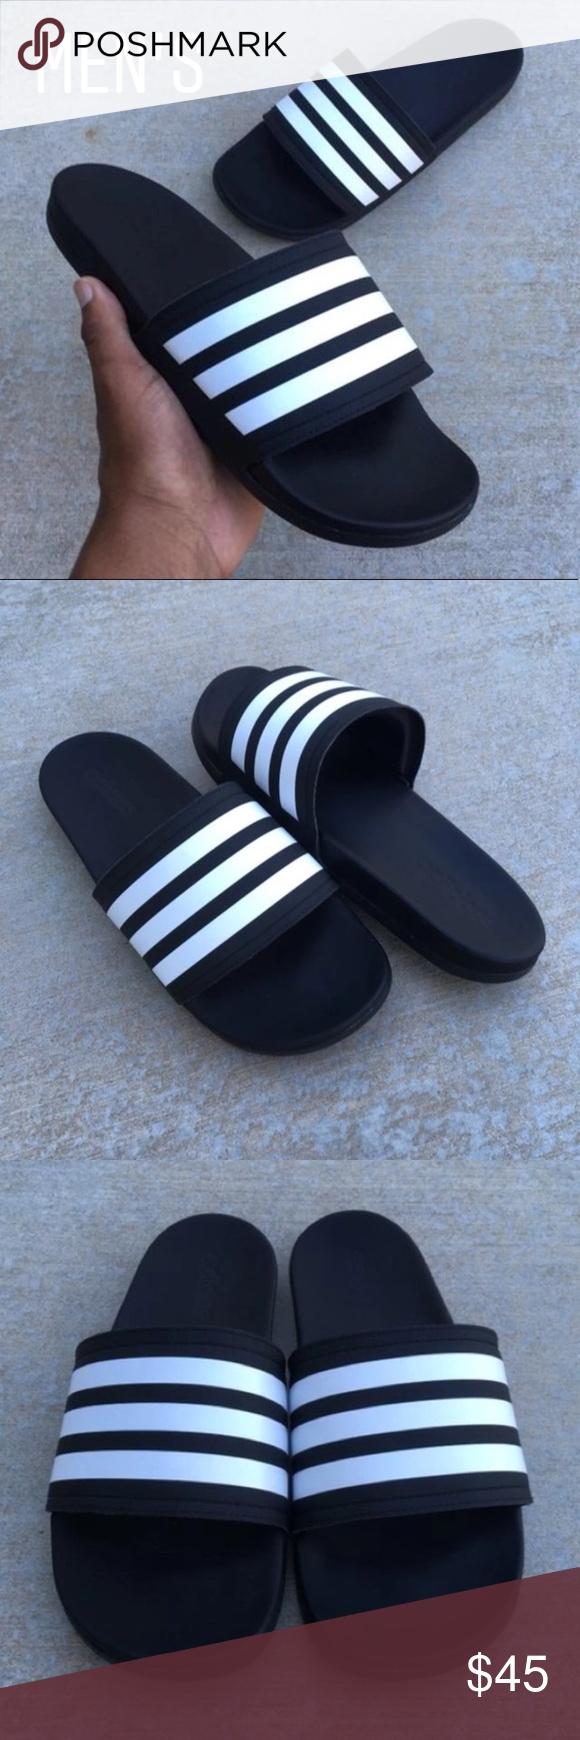 da412d764595 MENS BLK ADIDAS ADILETTE CLOUDFOAM STRIPES SLIDE Men Adidas Adilette  Comfort Cloud Foam Slides Sandal Black